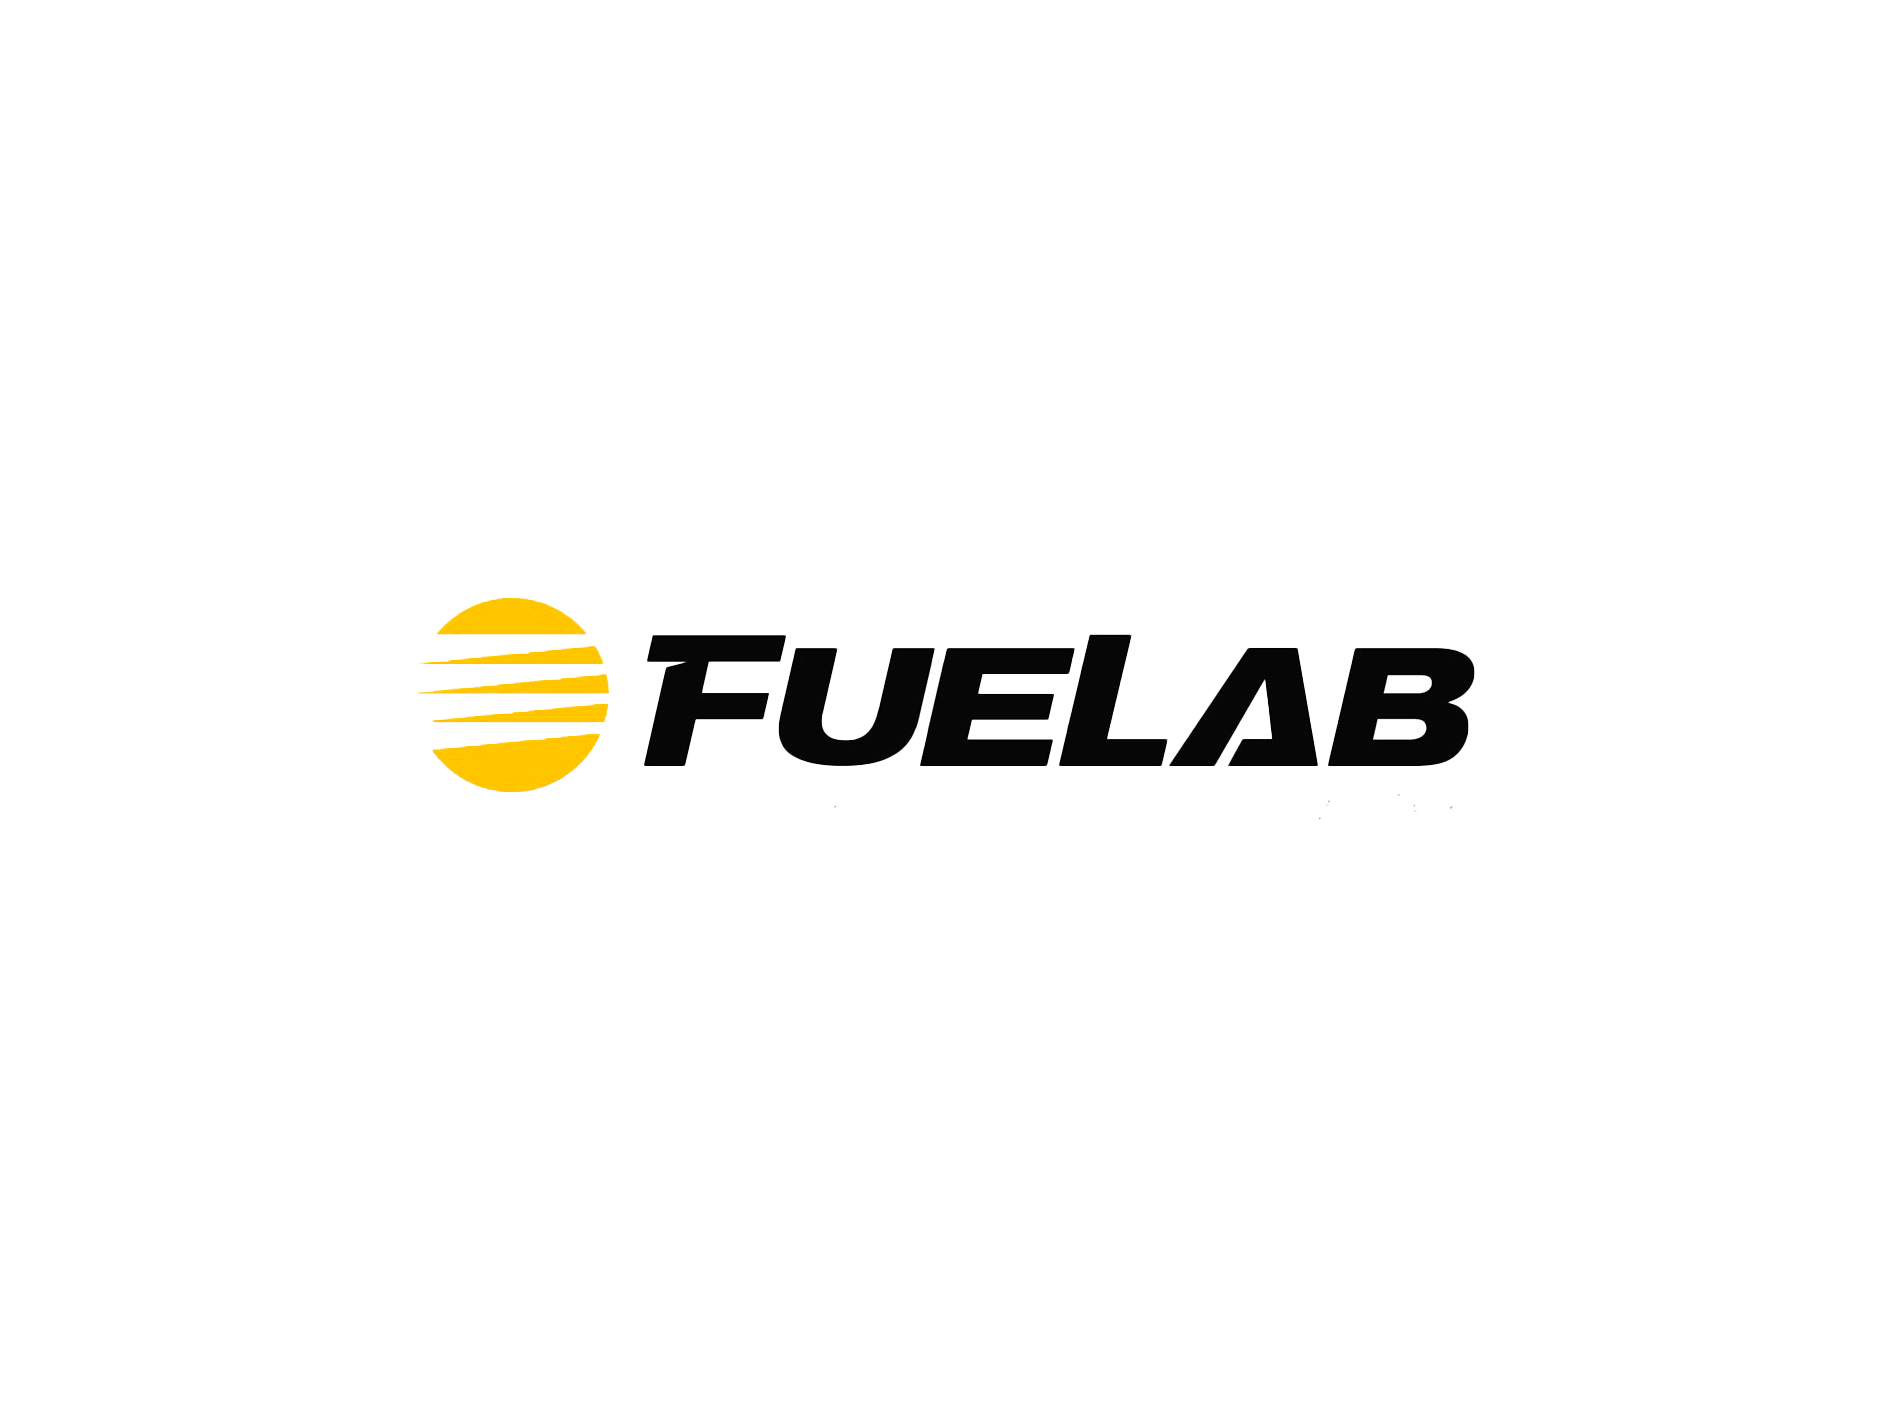 Fuelab